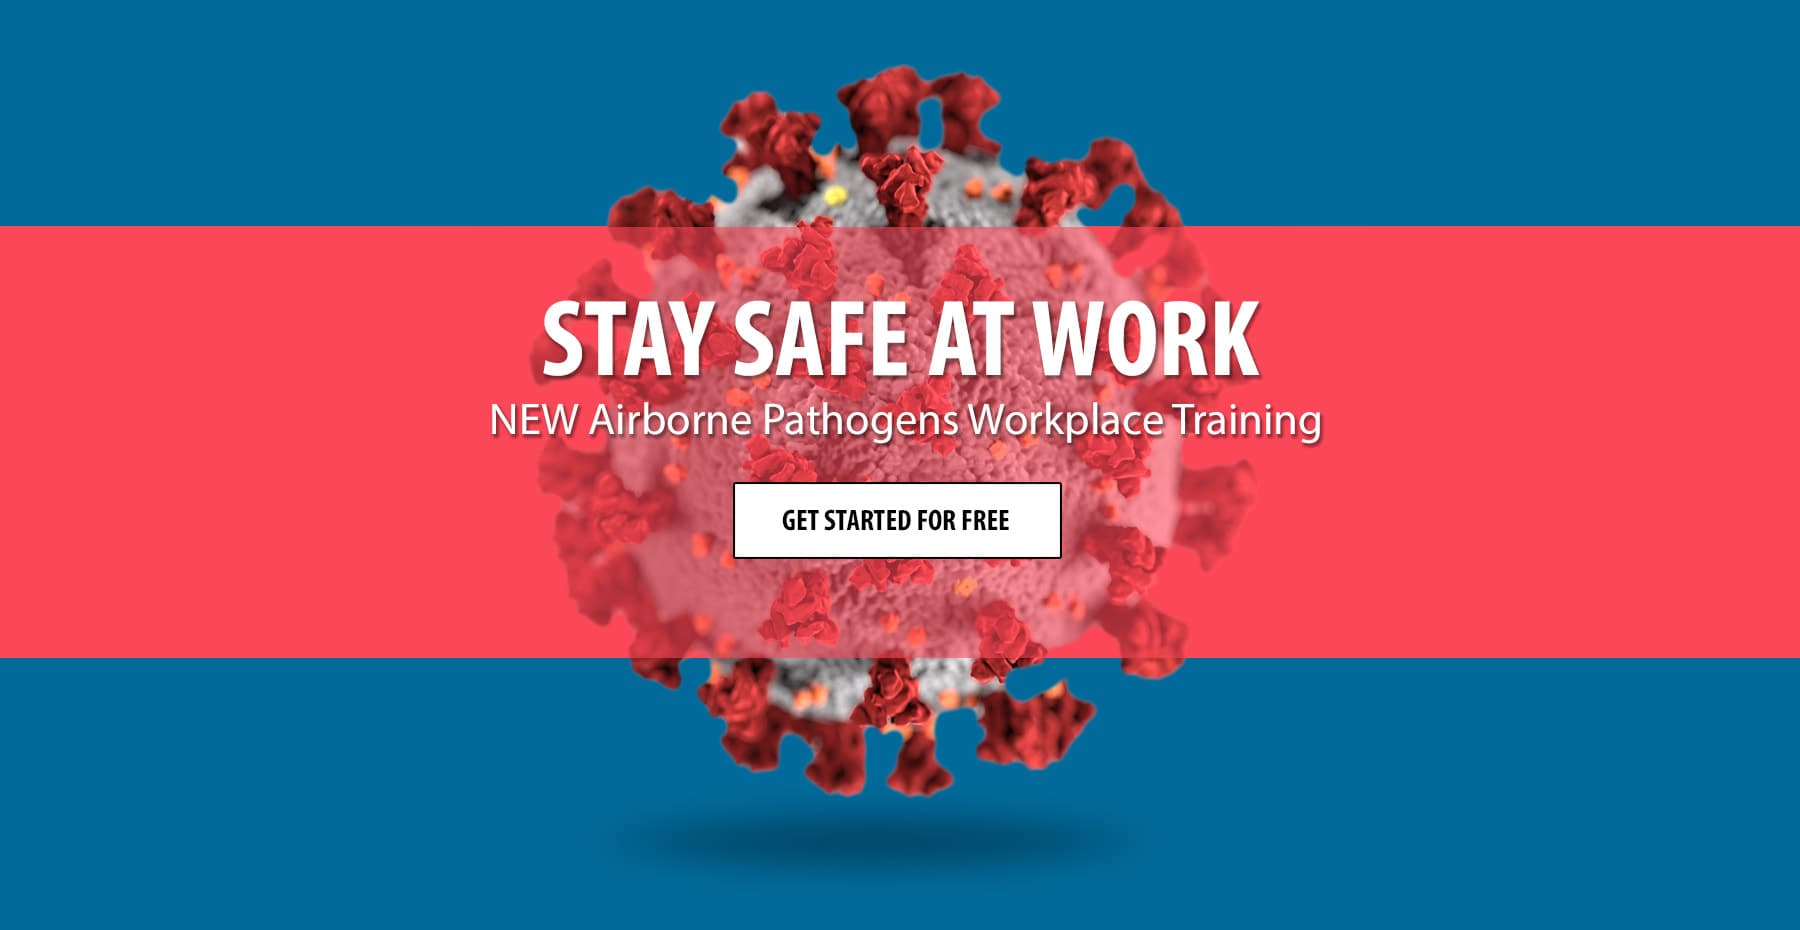 First Response Training International - Airborne Pathogen Workplace Training course